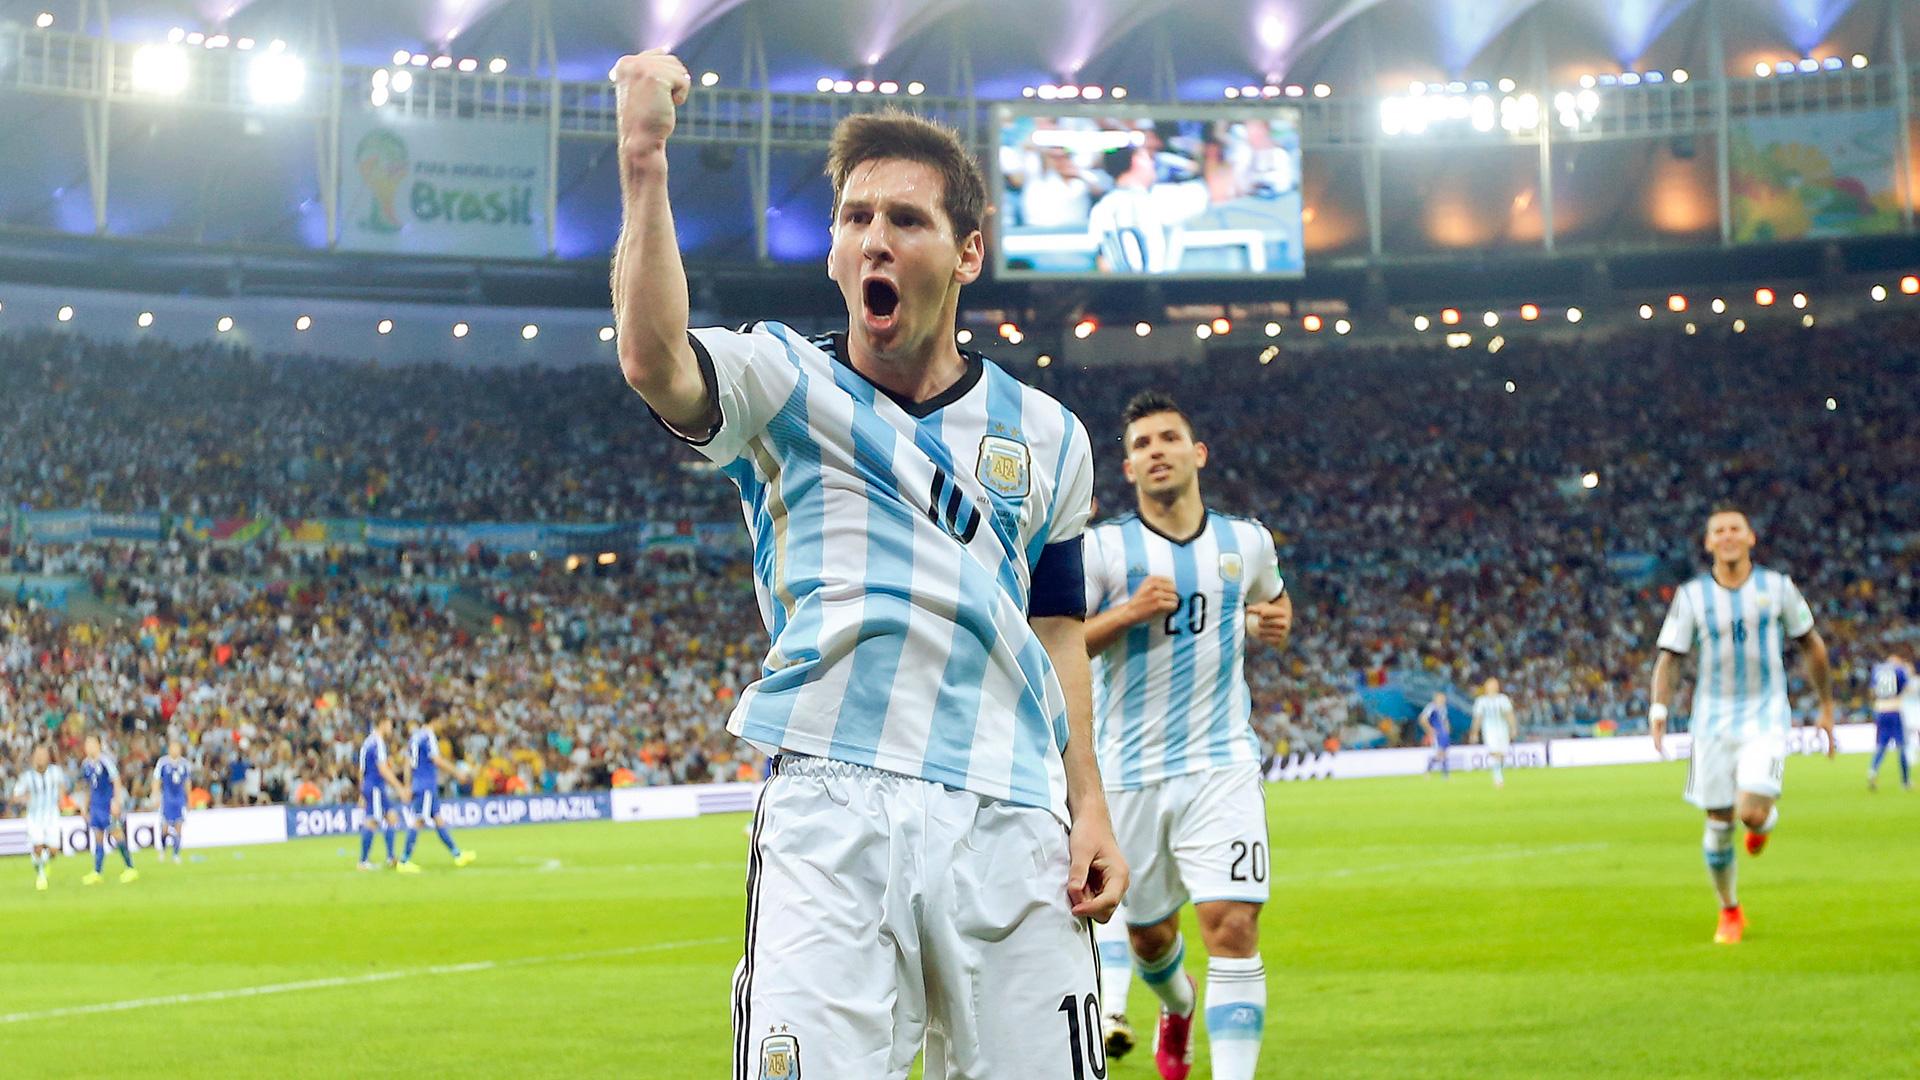 Lionel Messi-061414-AP-FTR.jpg